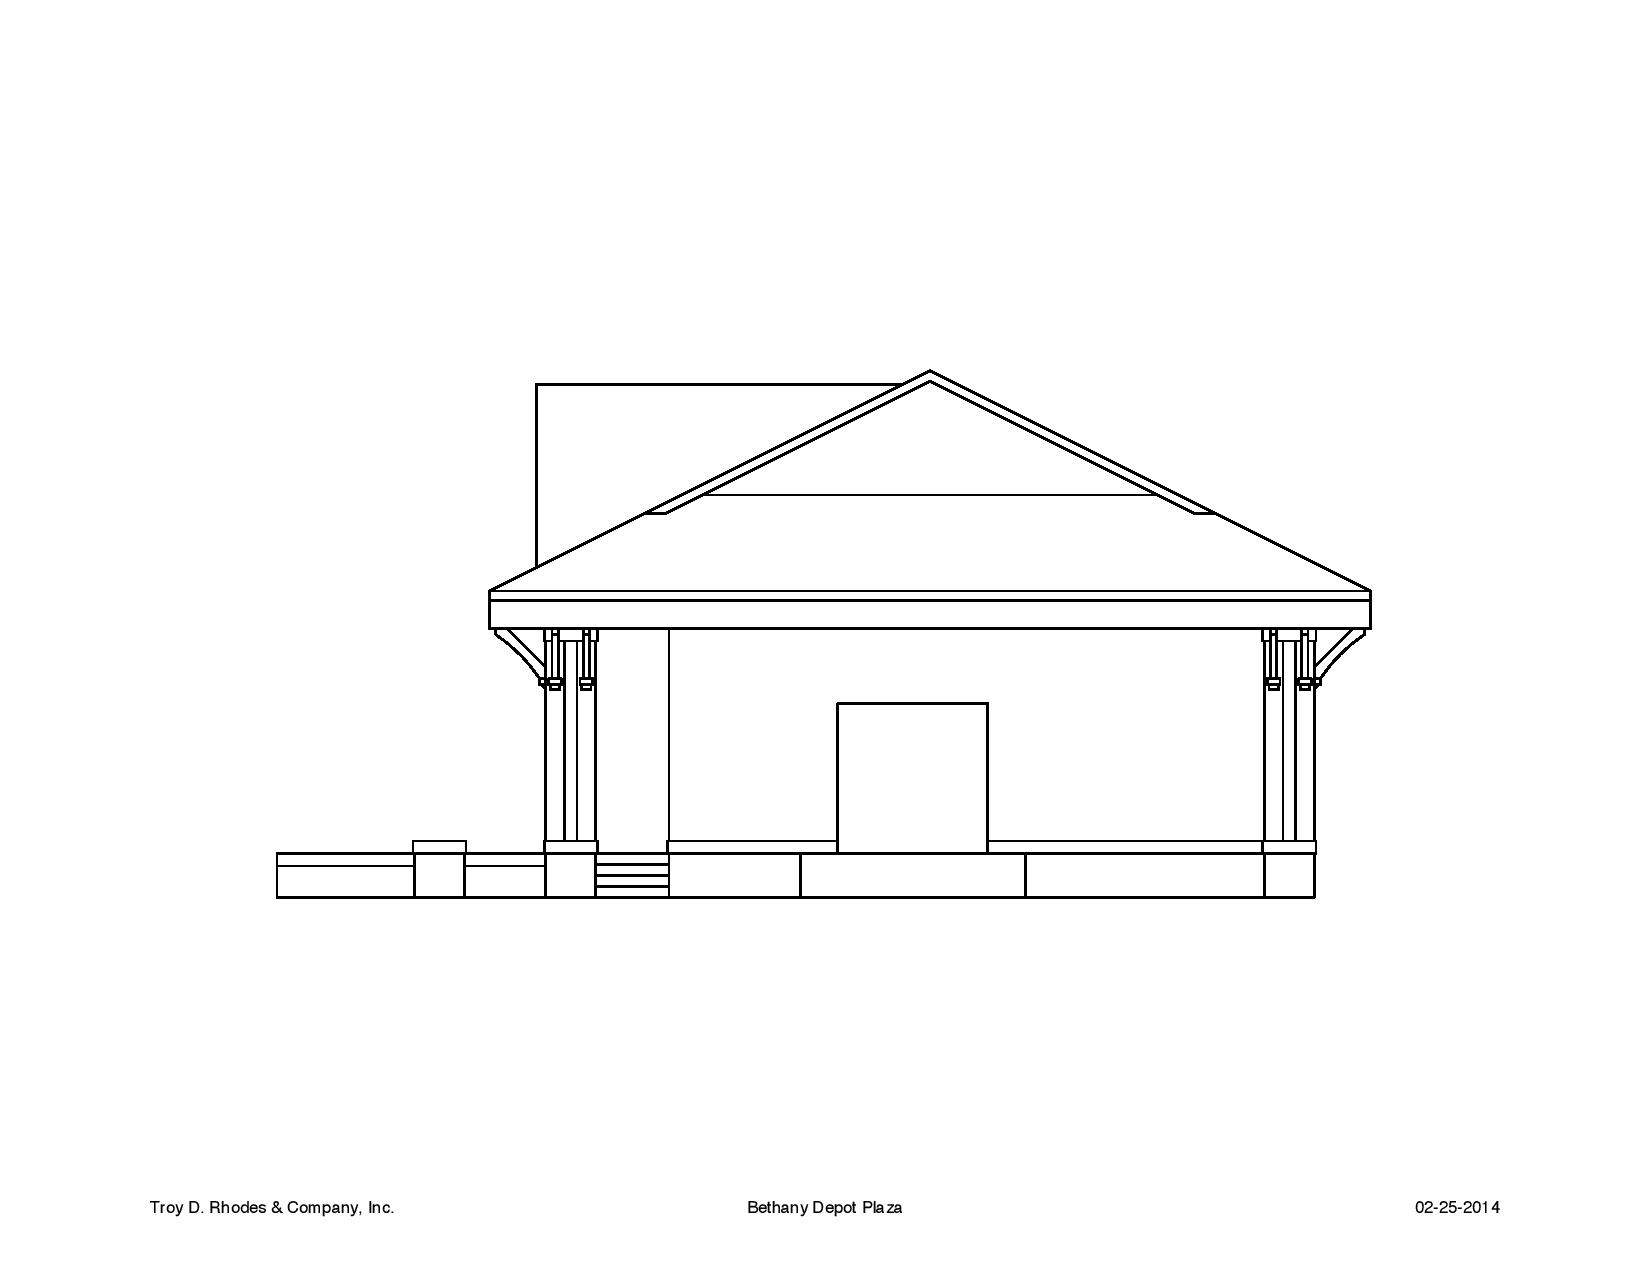 Bethany Depot Plaza Final 2-25-14-page-010.jpg